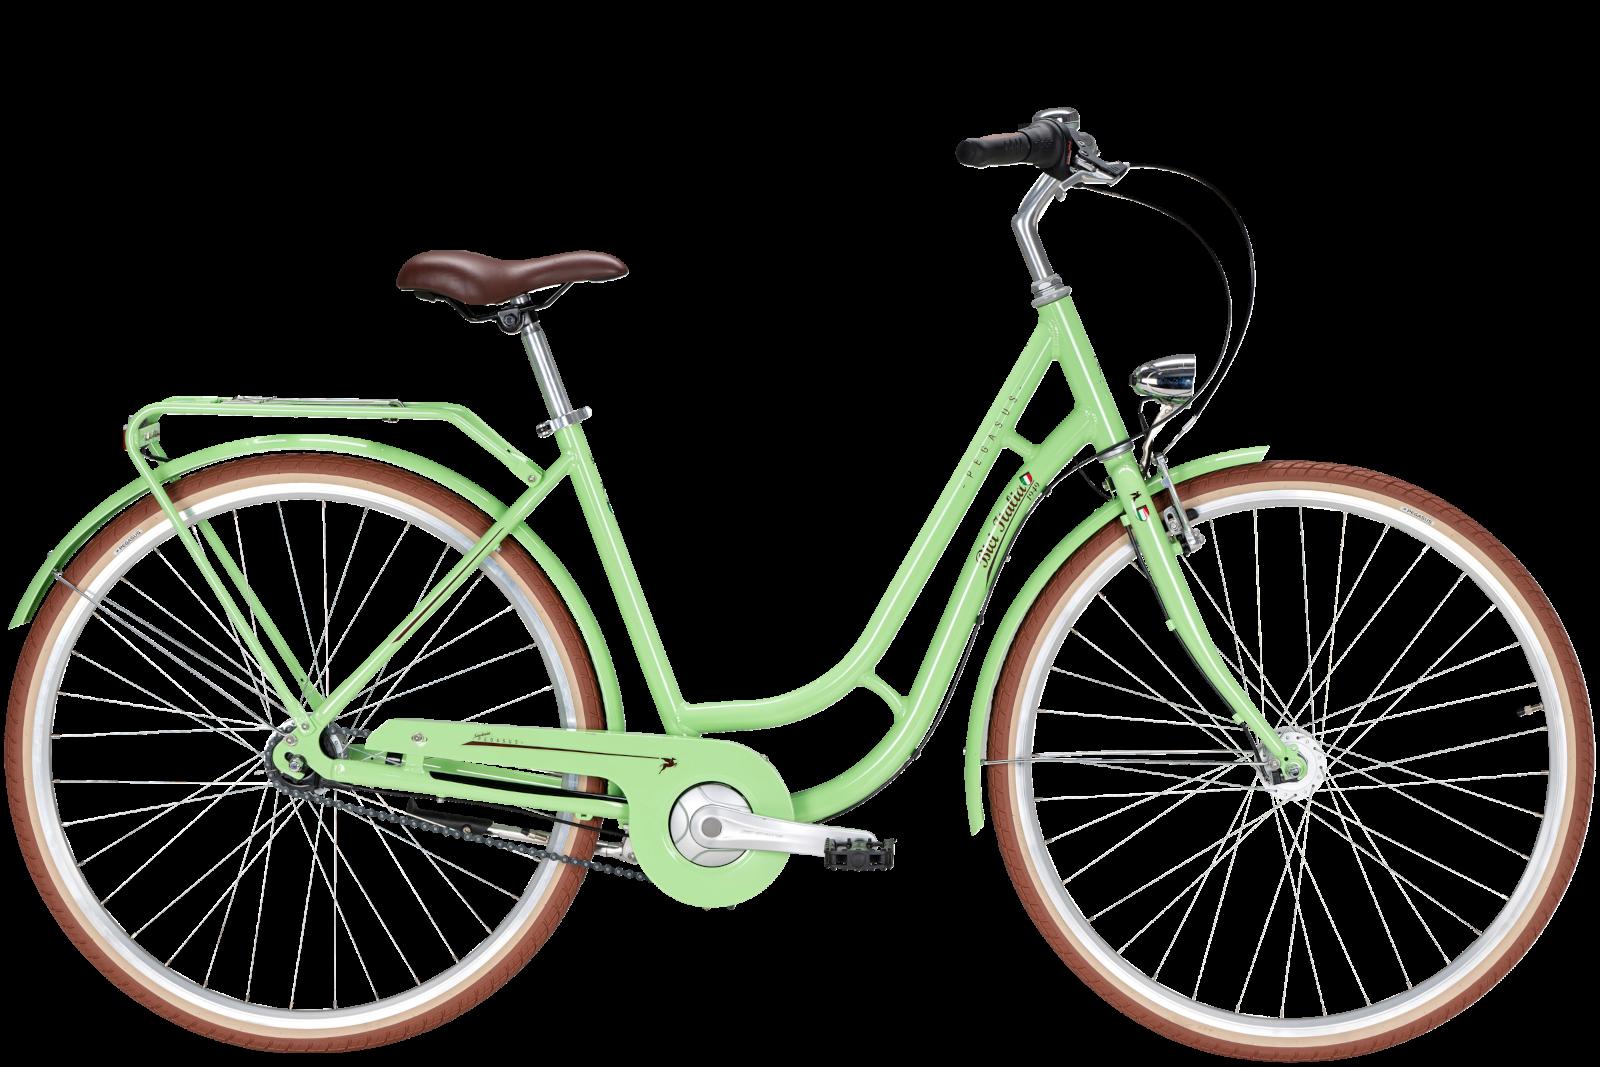 Pegasus Bici Italia 7-Gang pistacchio green